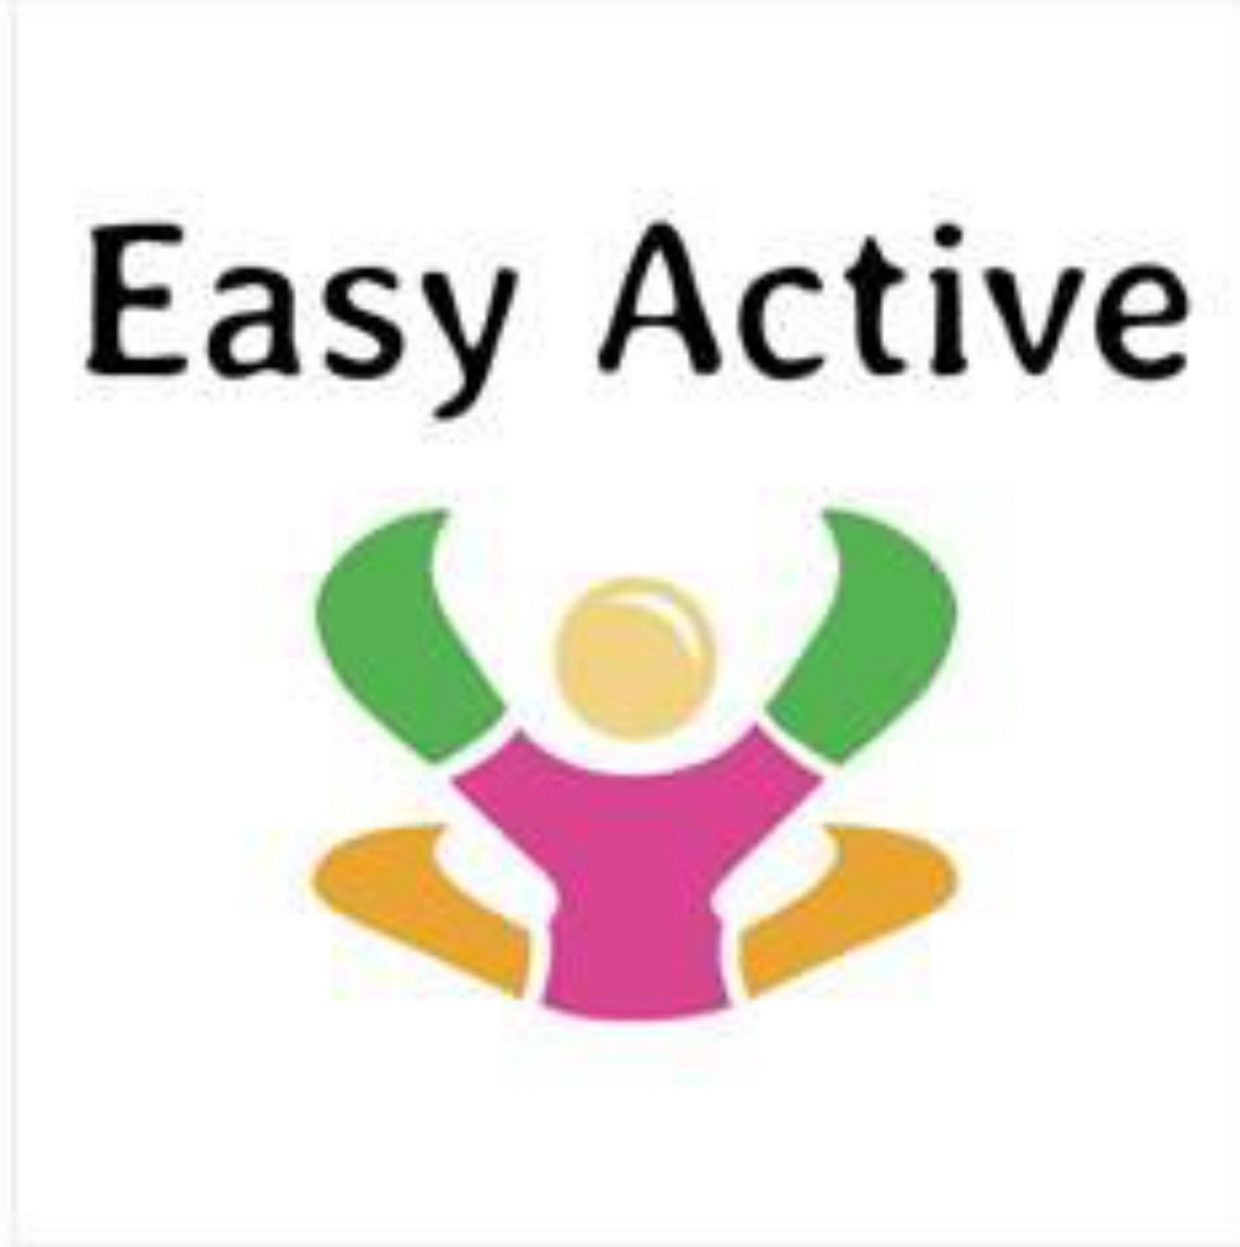 Easy active logo